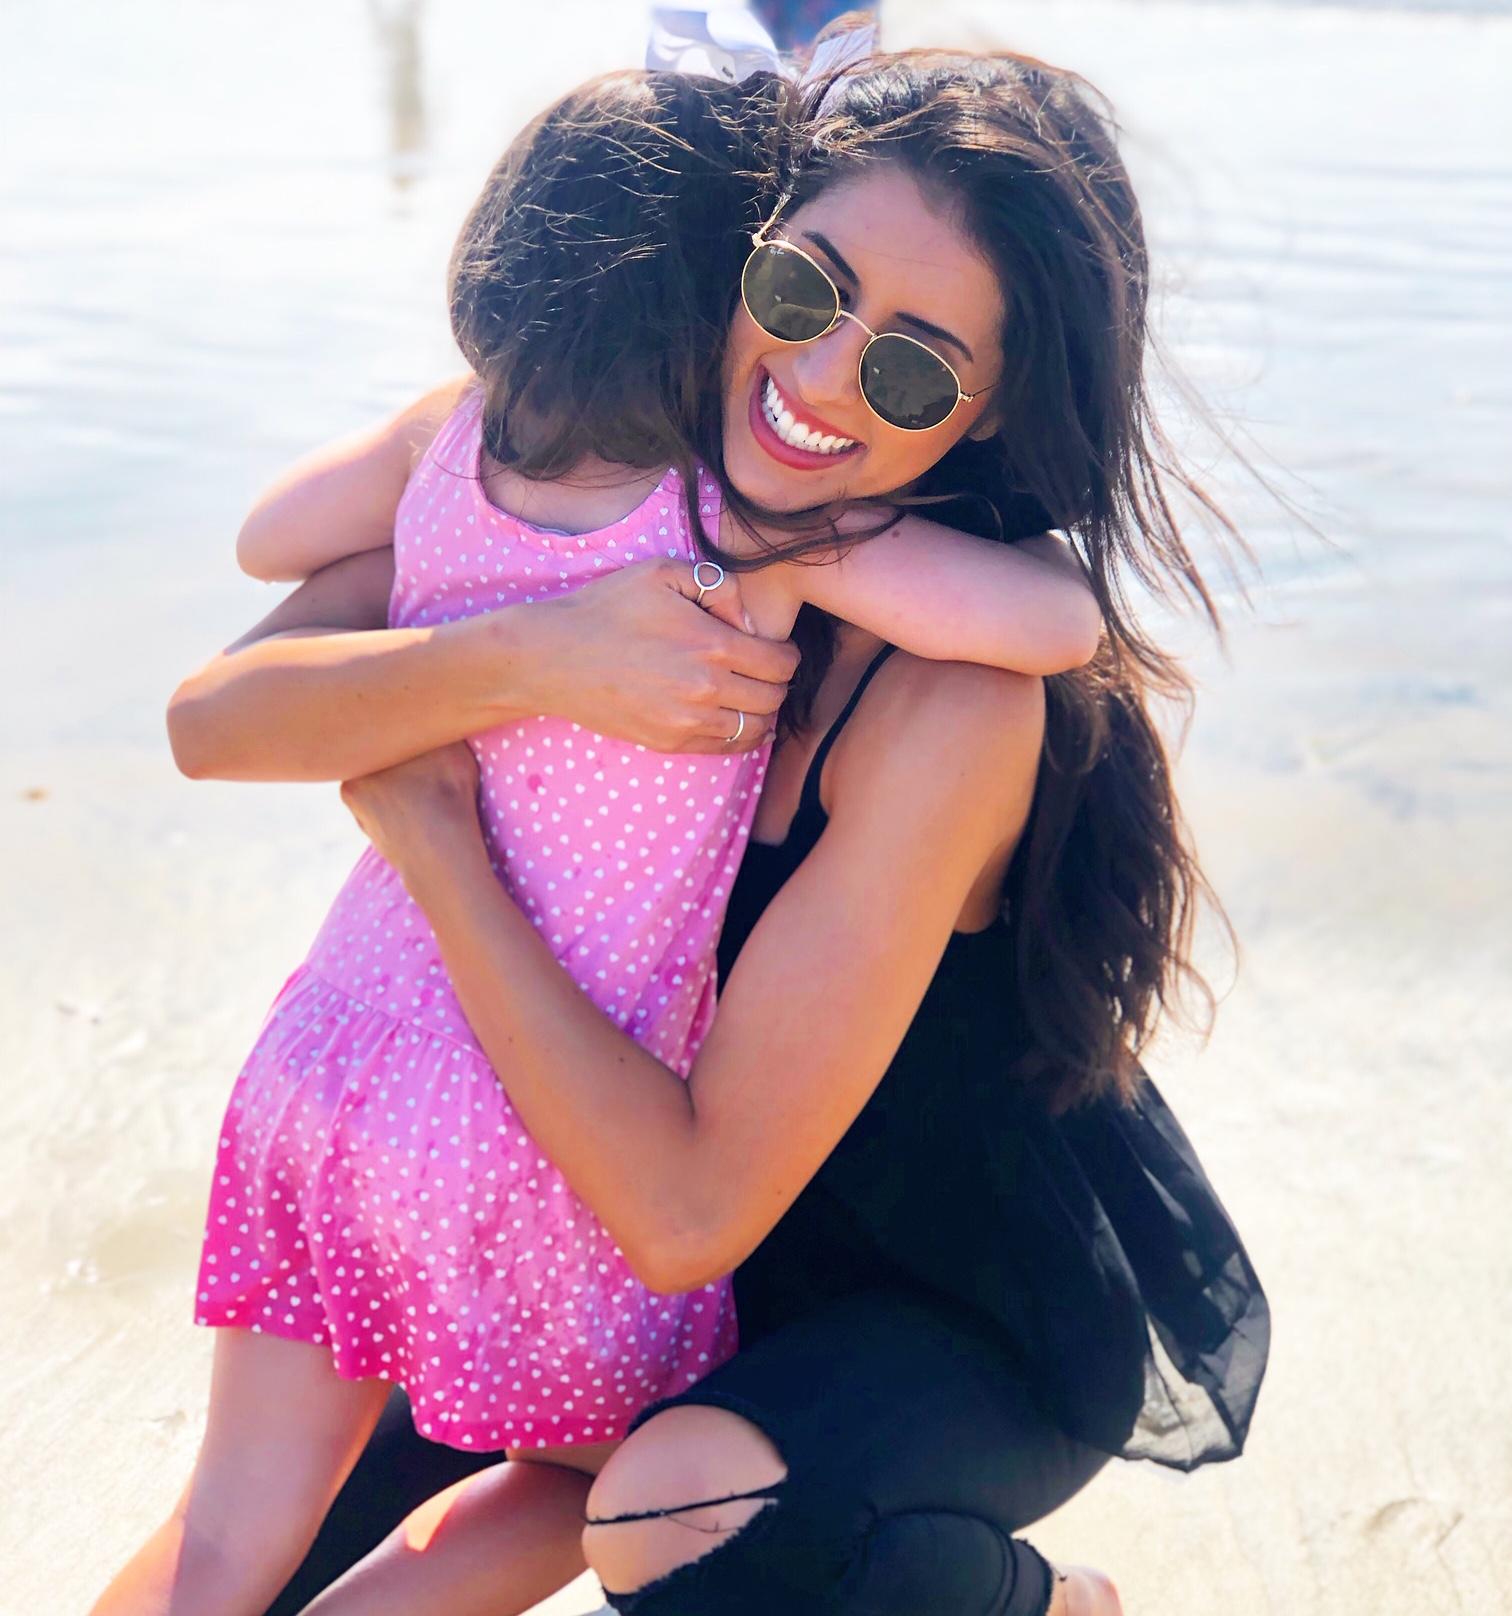 Caelin hugs Campbell